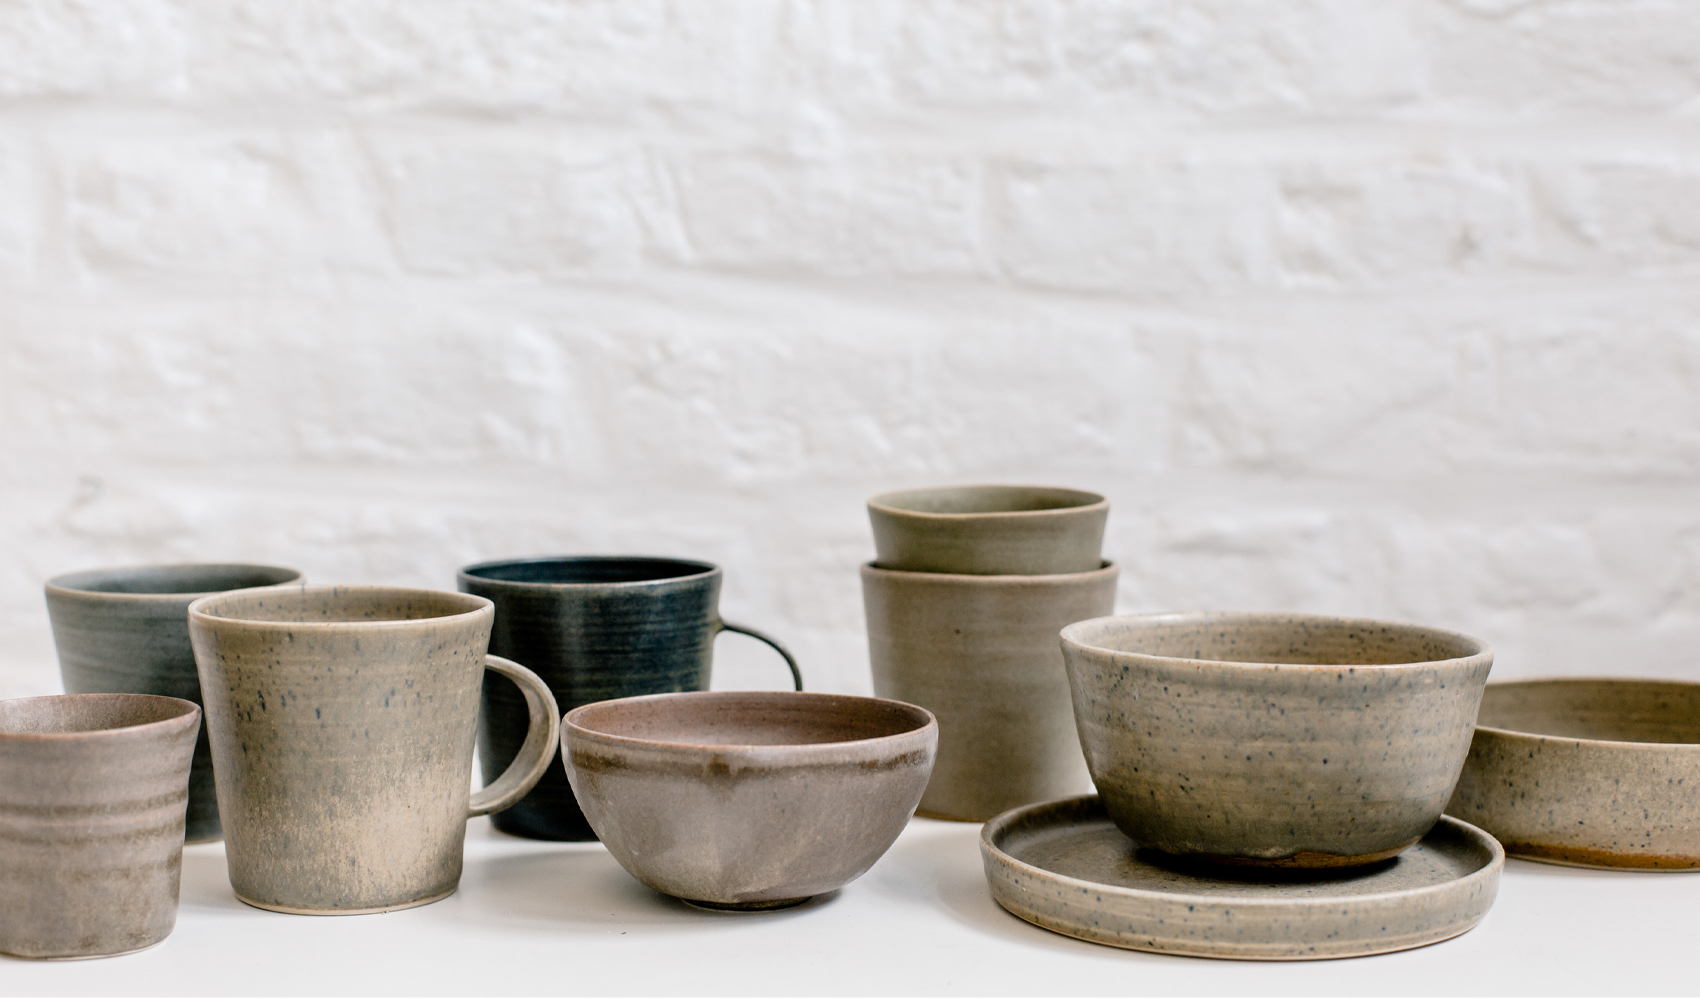 banniere-ceramique-4